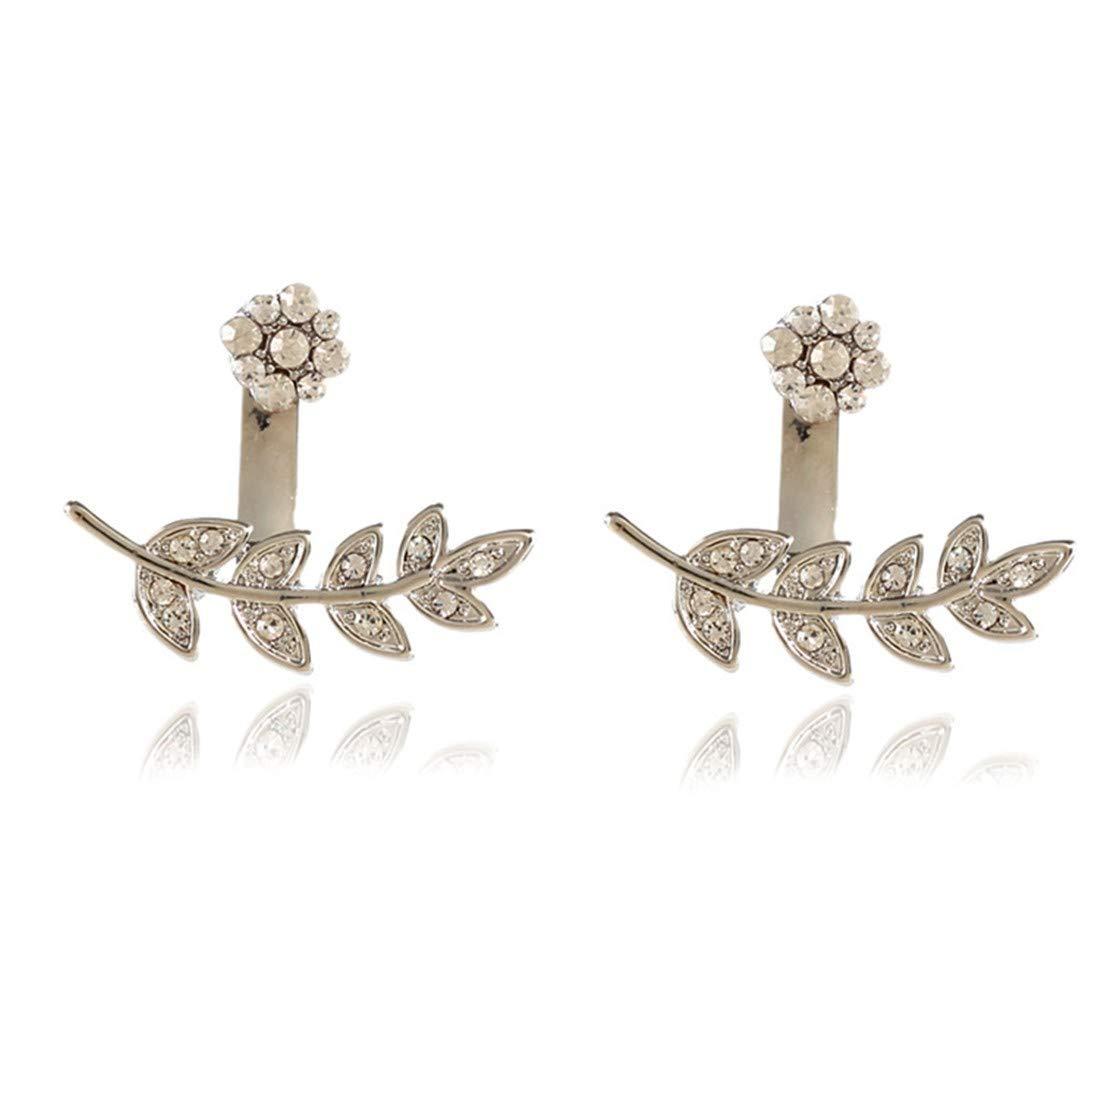 ball earrings|clip on earrings|ear cuffs|dangle earrings|earring jackets|hoop earrings|stud earrings|Ears and ears are full of drill studs.